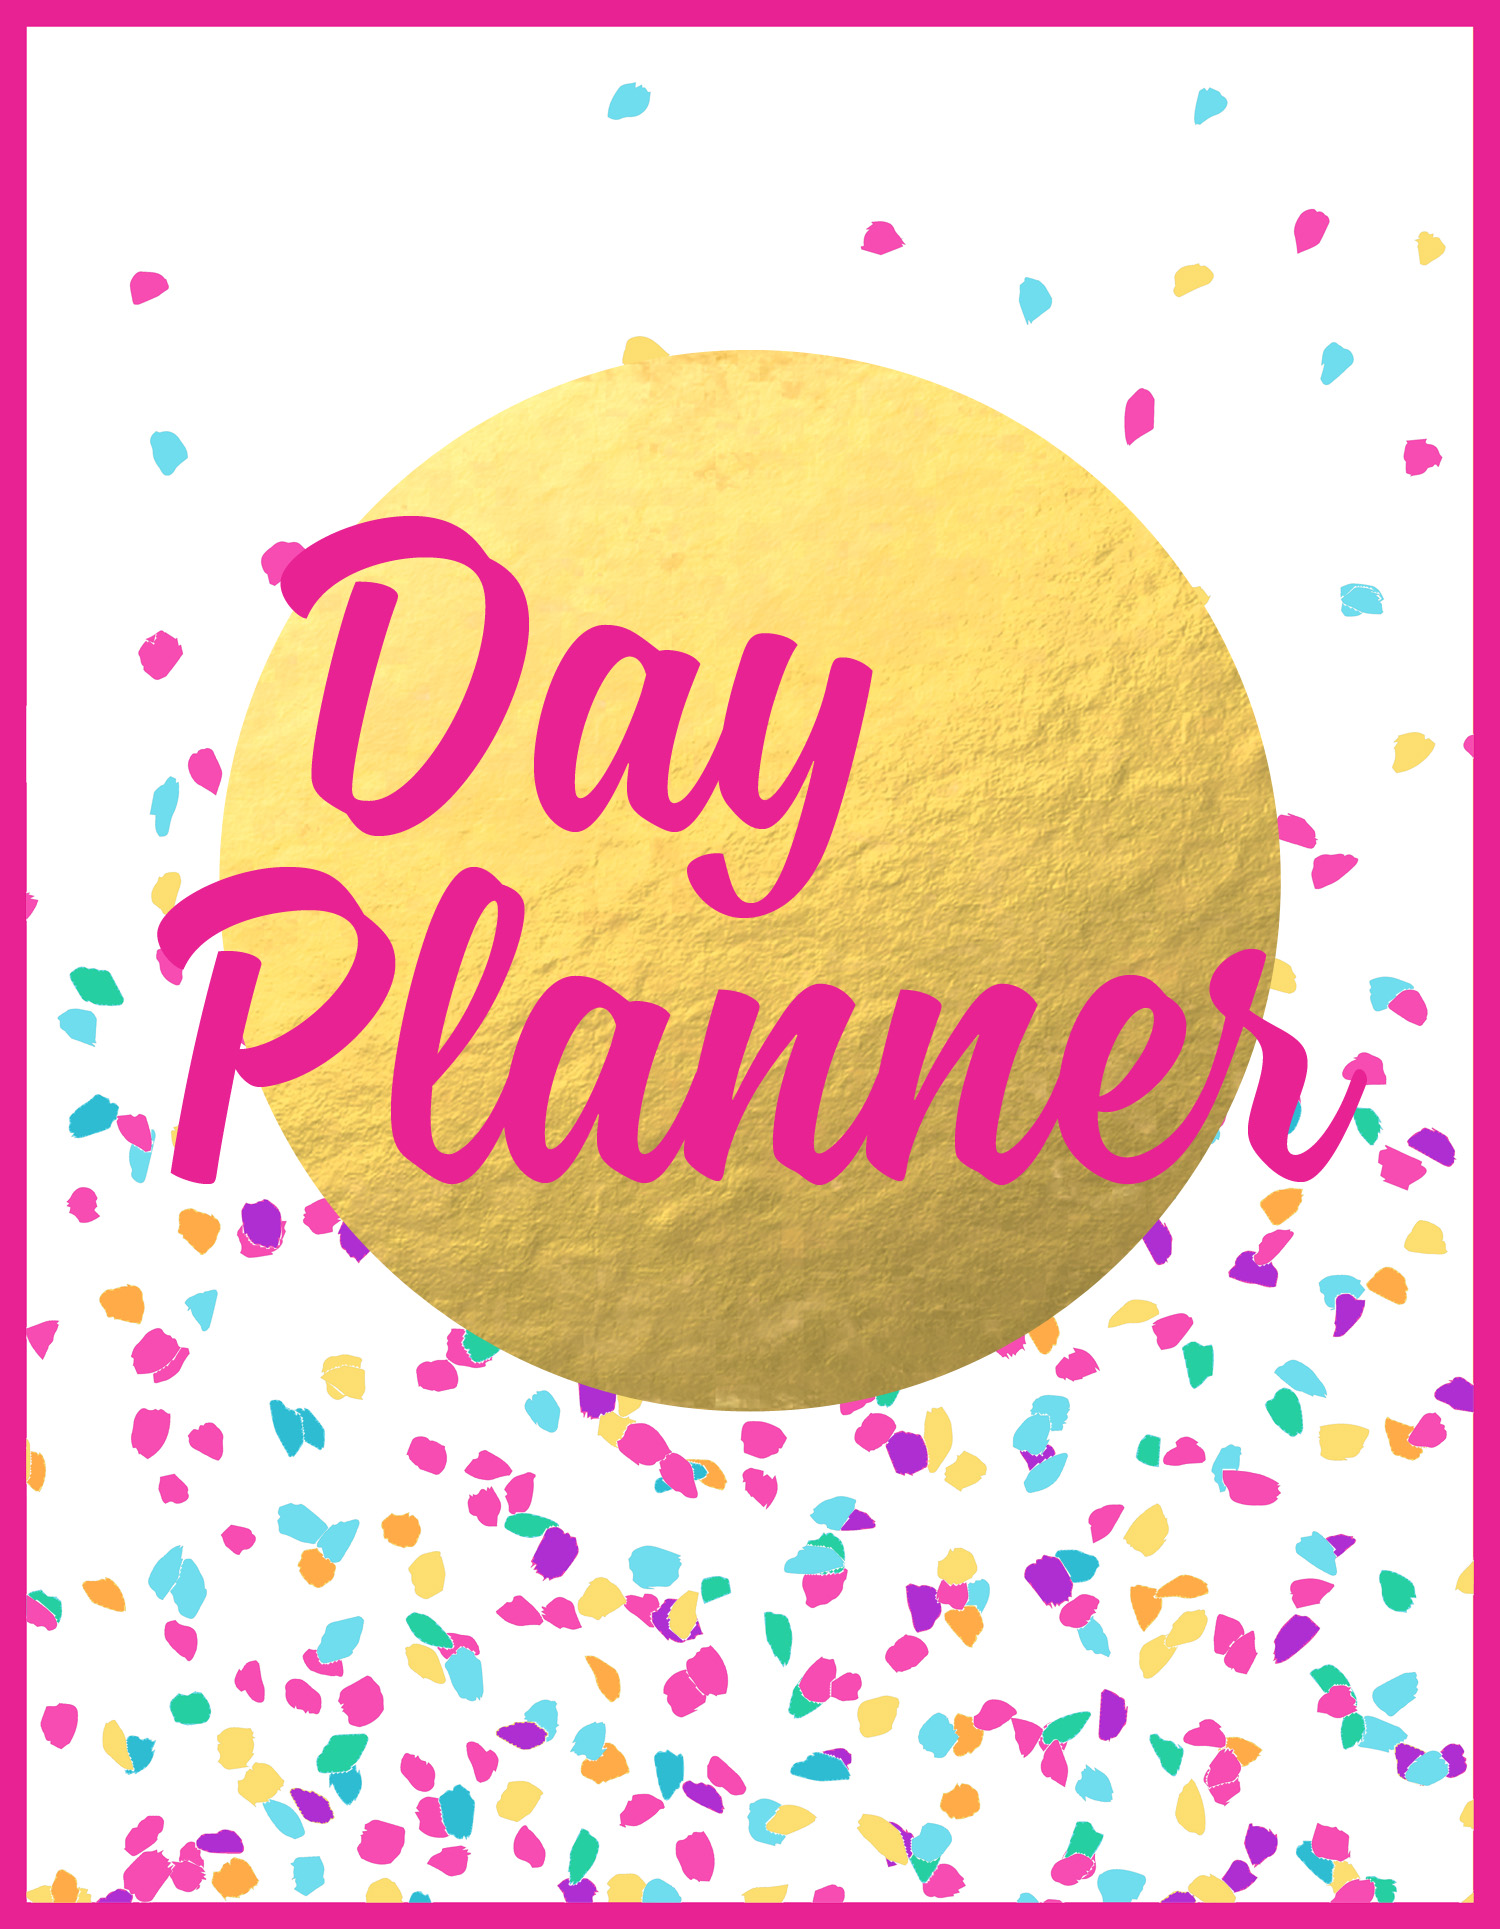 Julia Jackson Day Planner